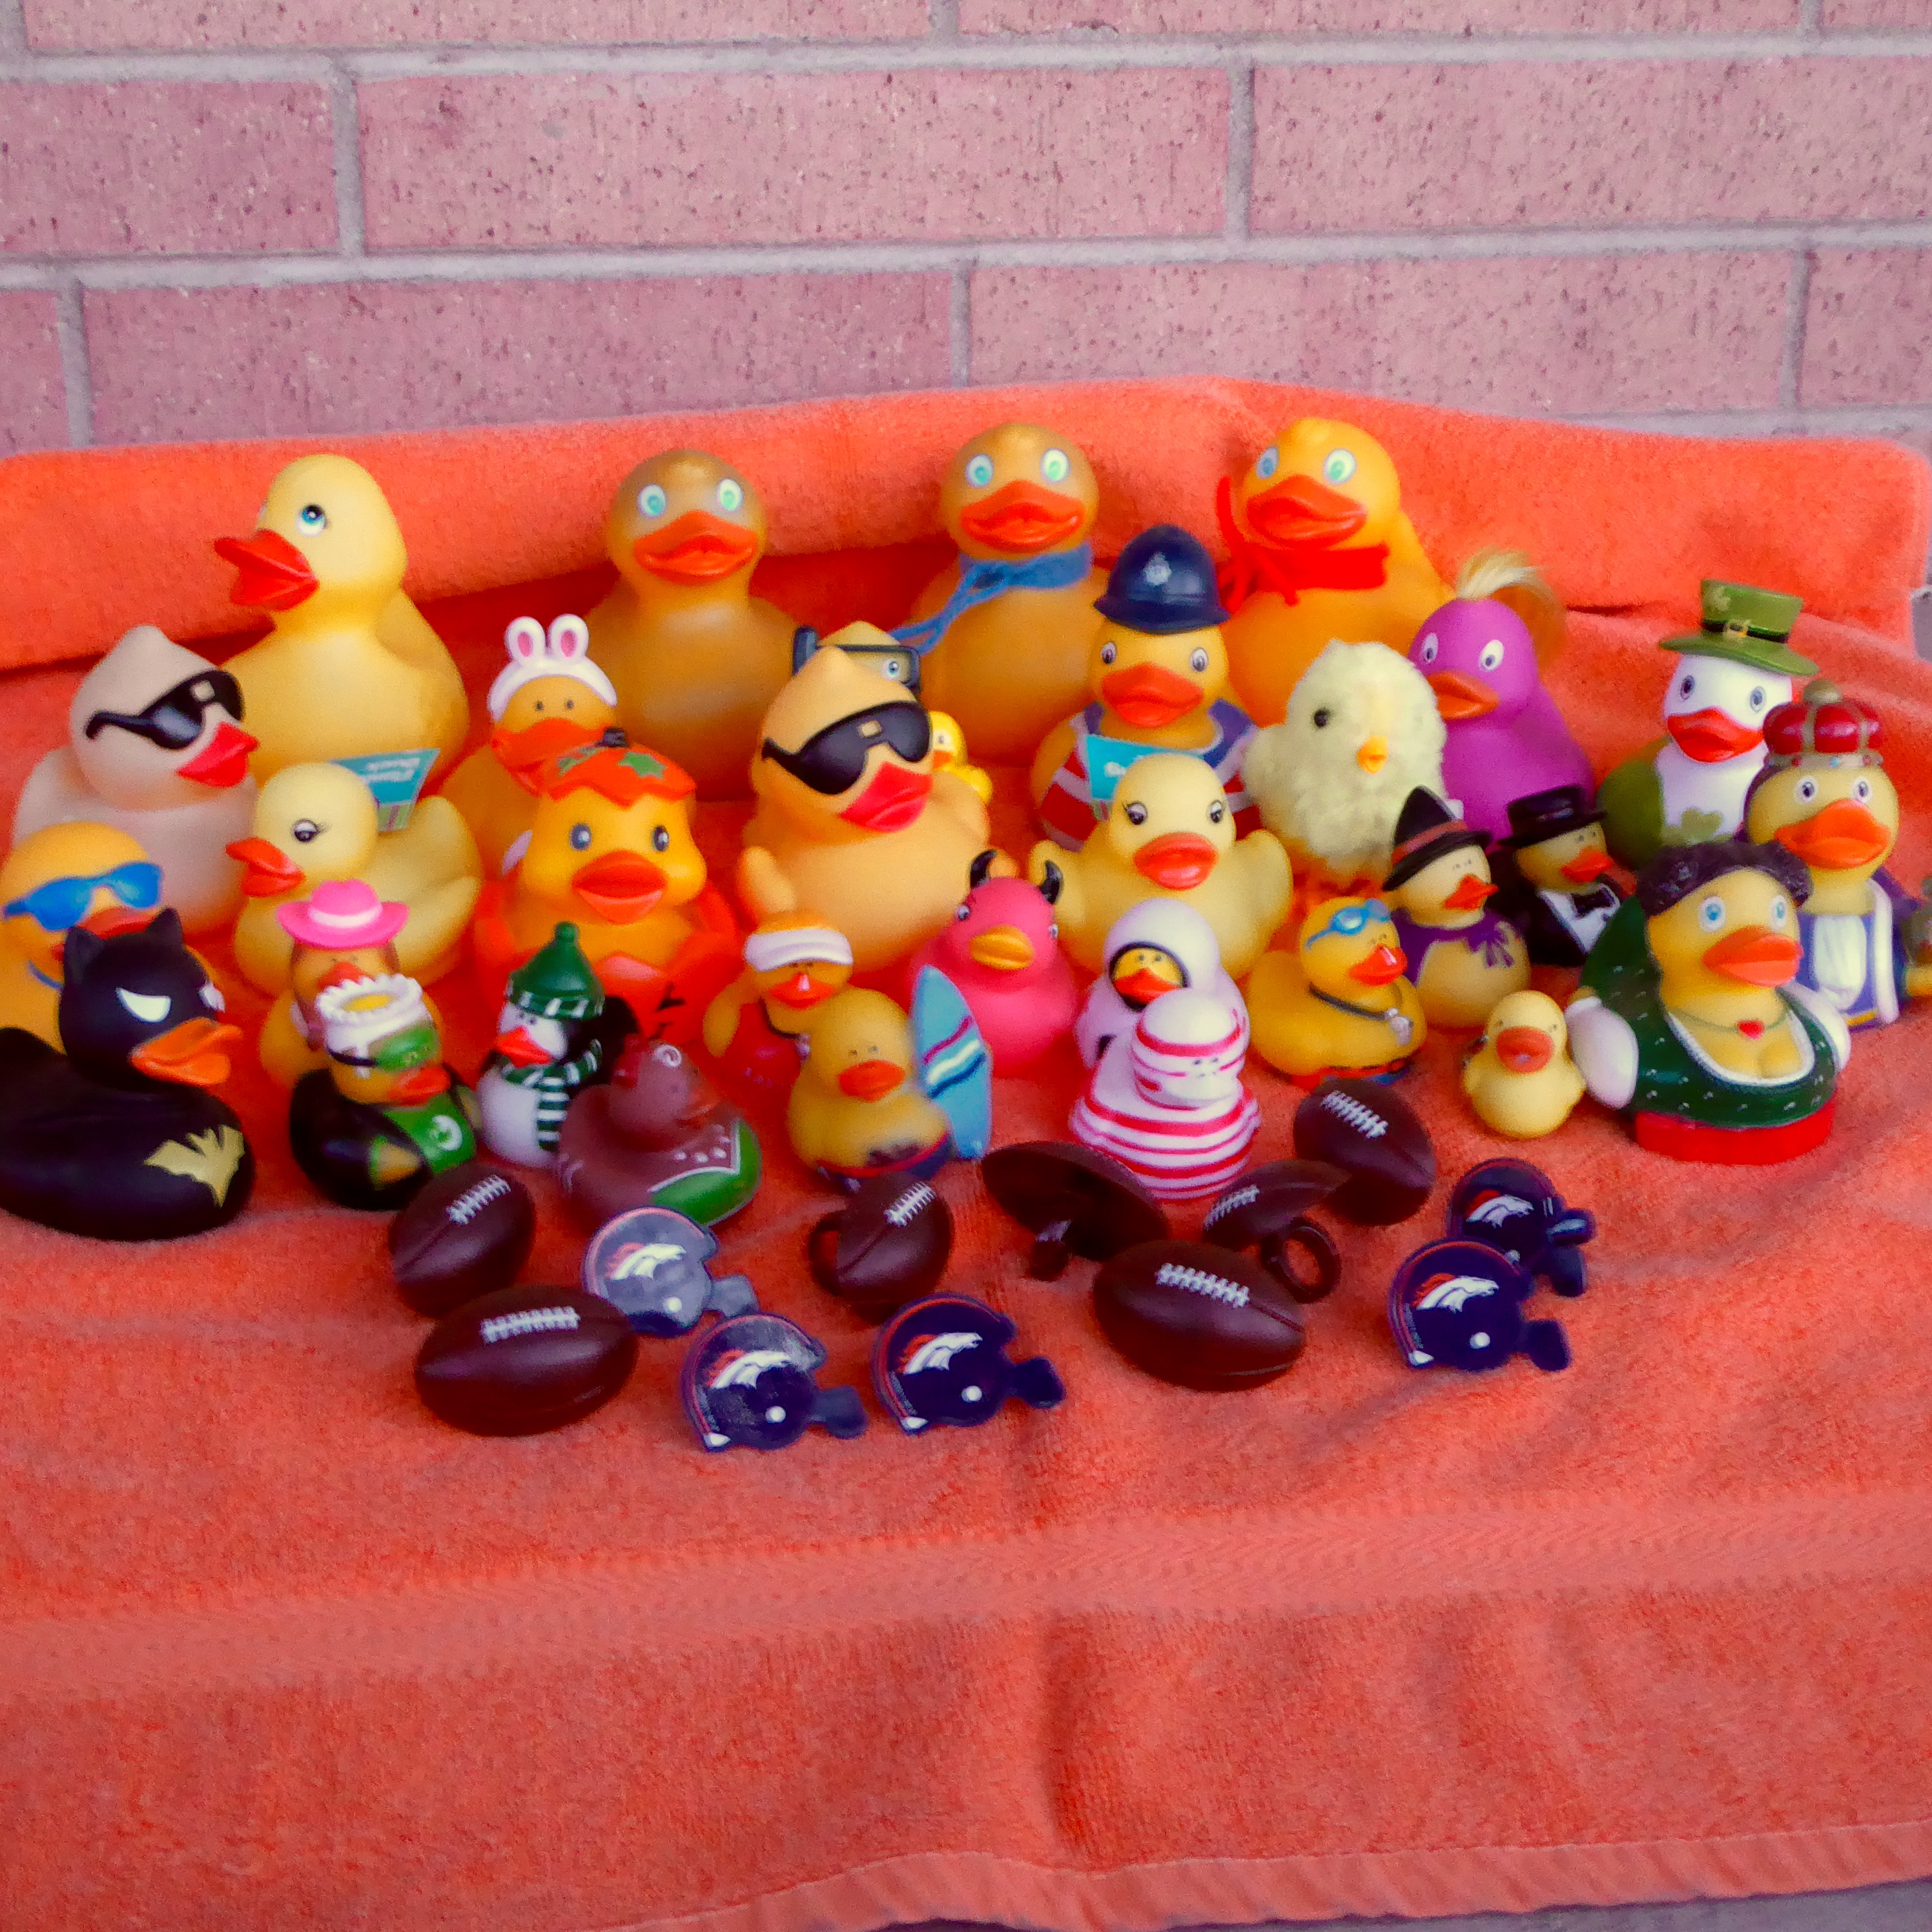 Denver Broncos Duck Bank